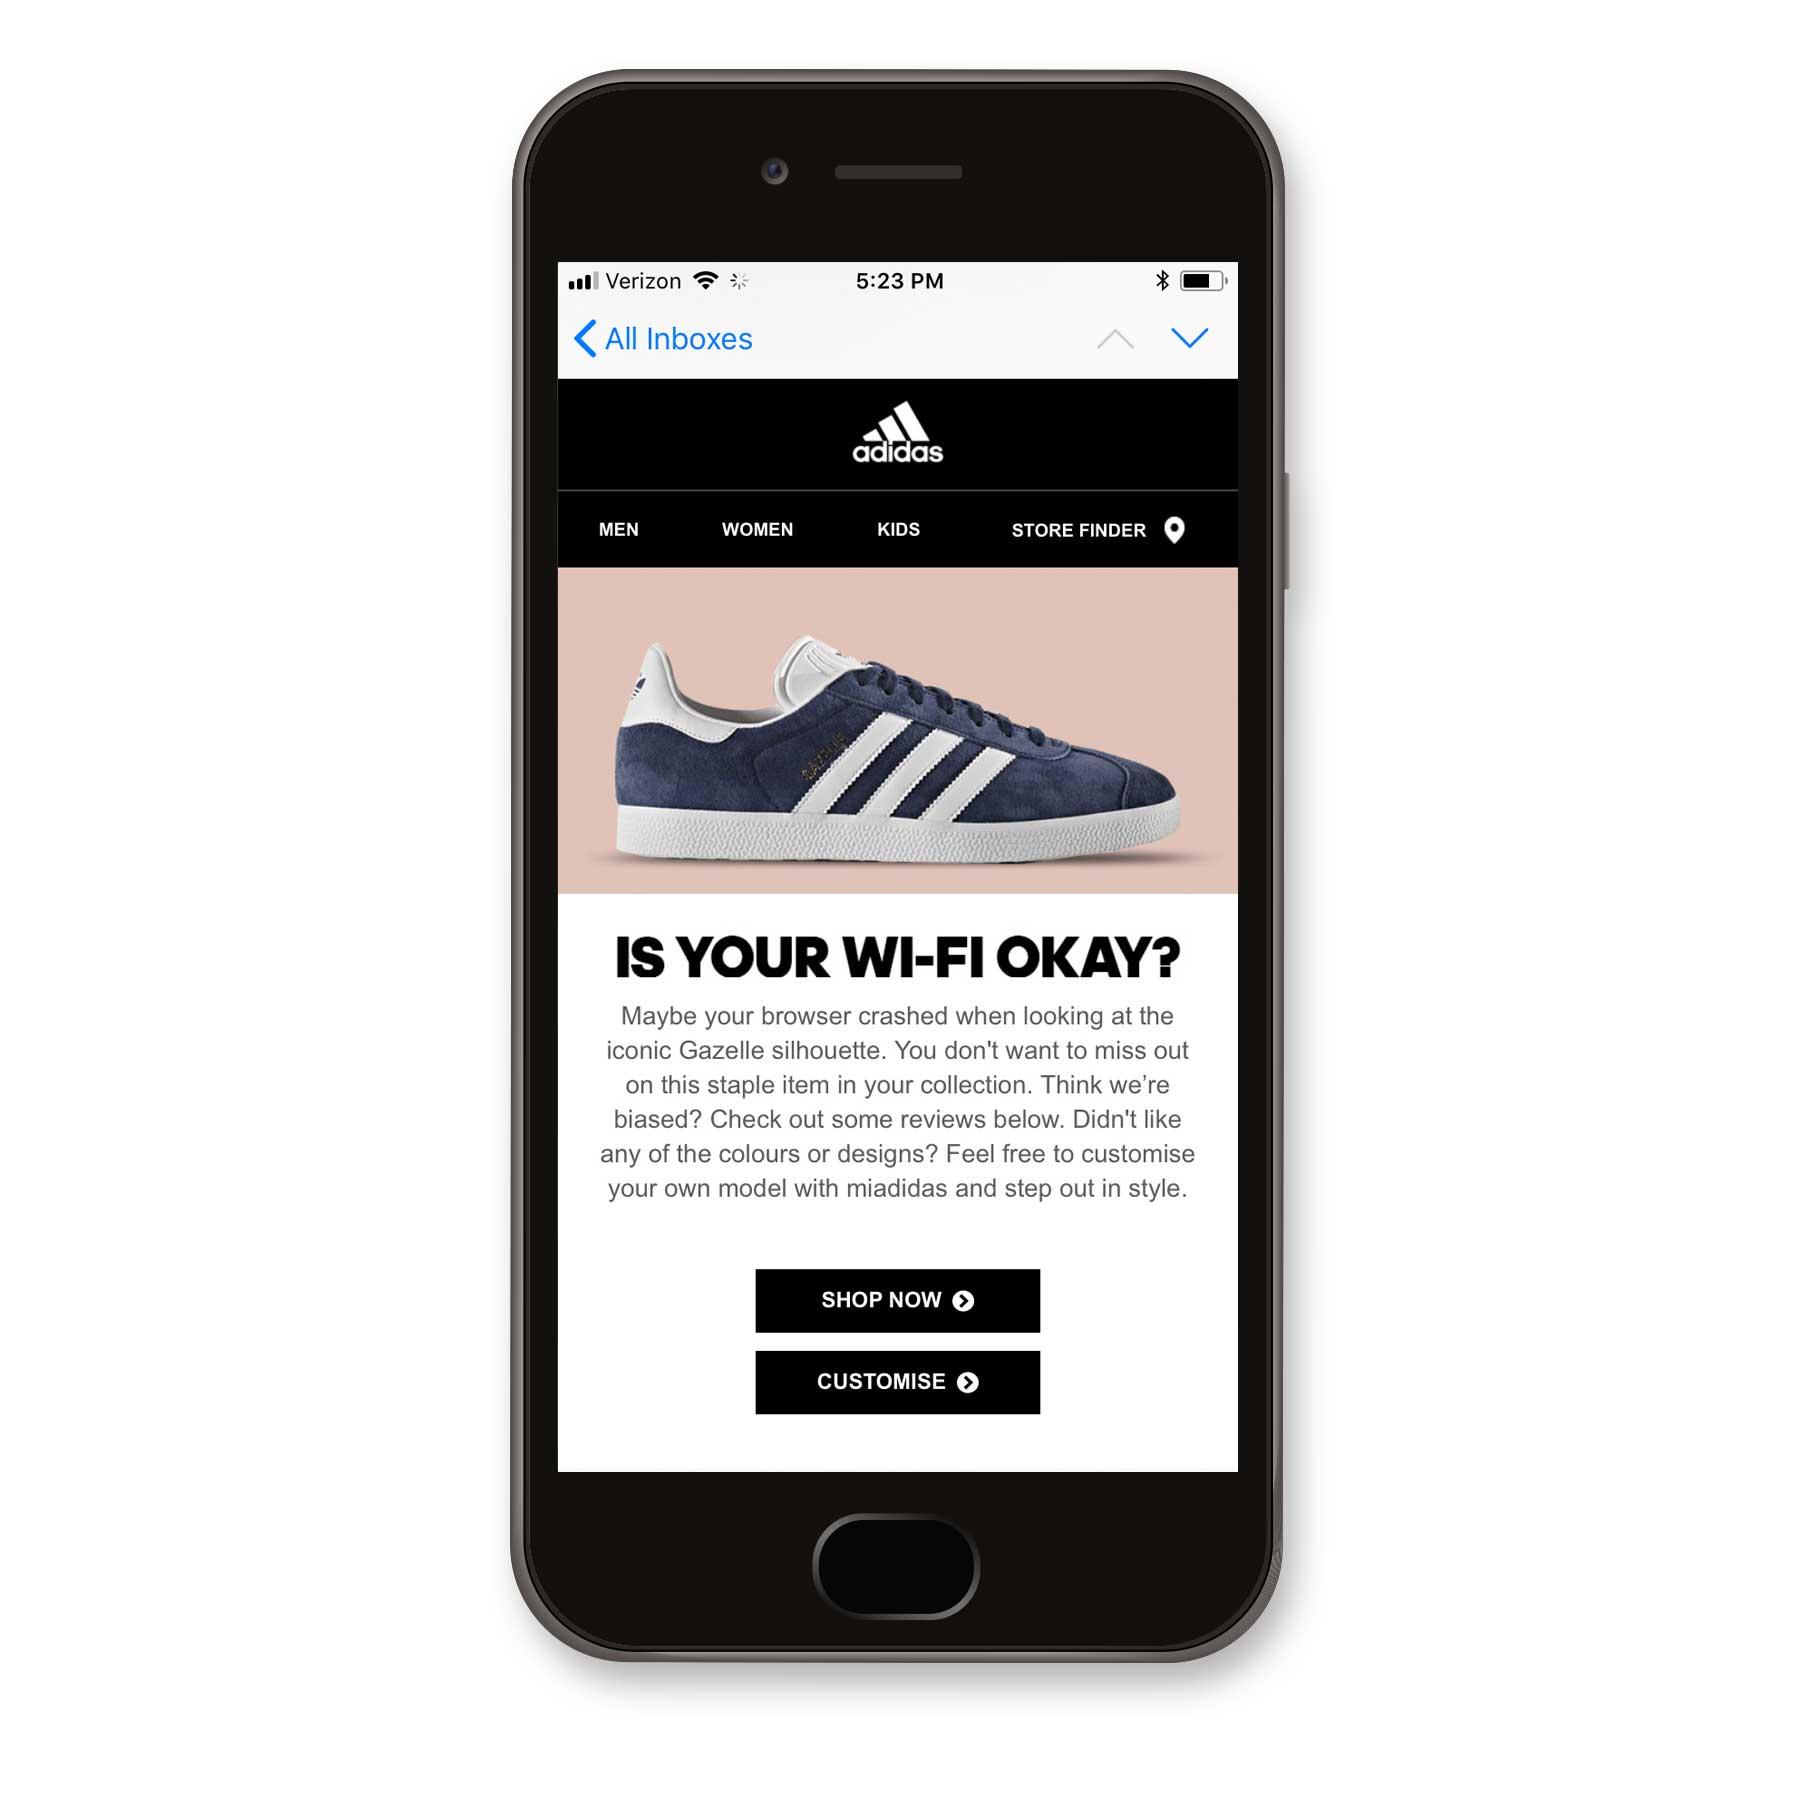 Adidas Abandonment Email